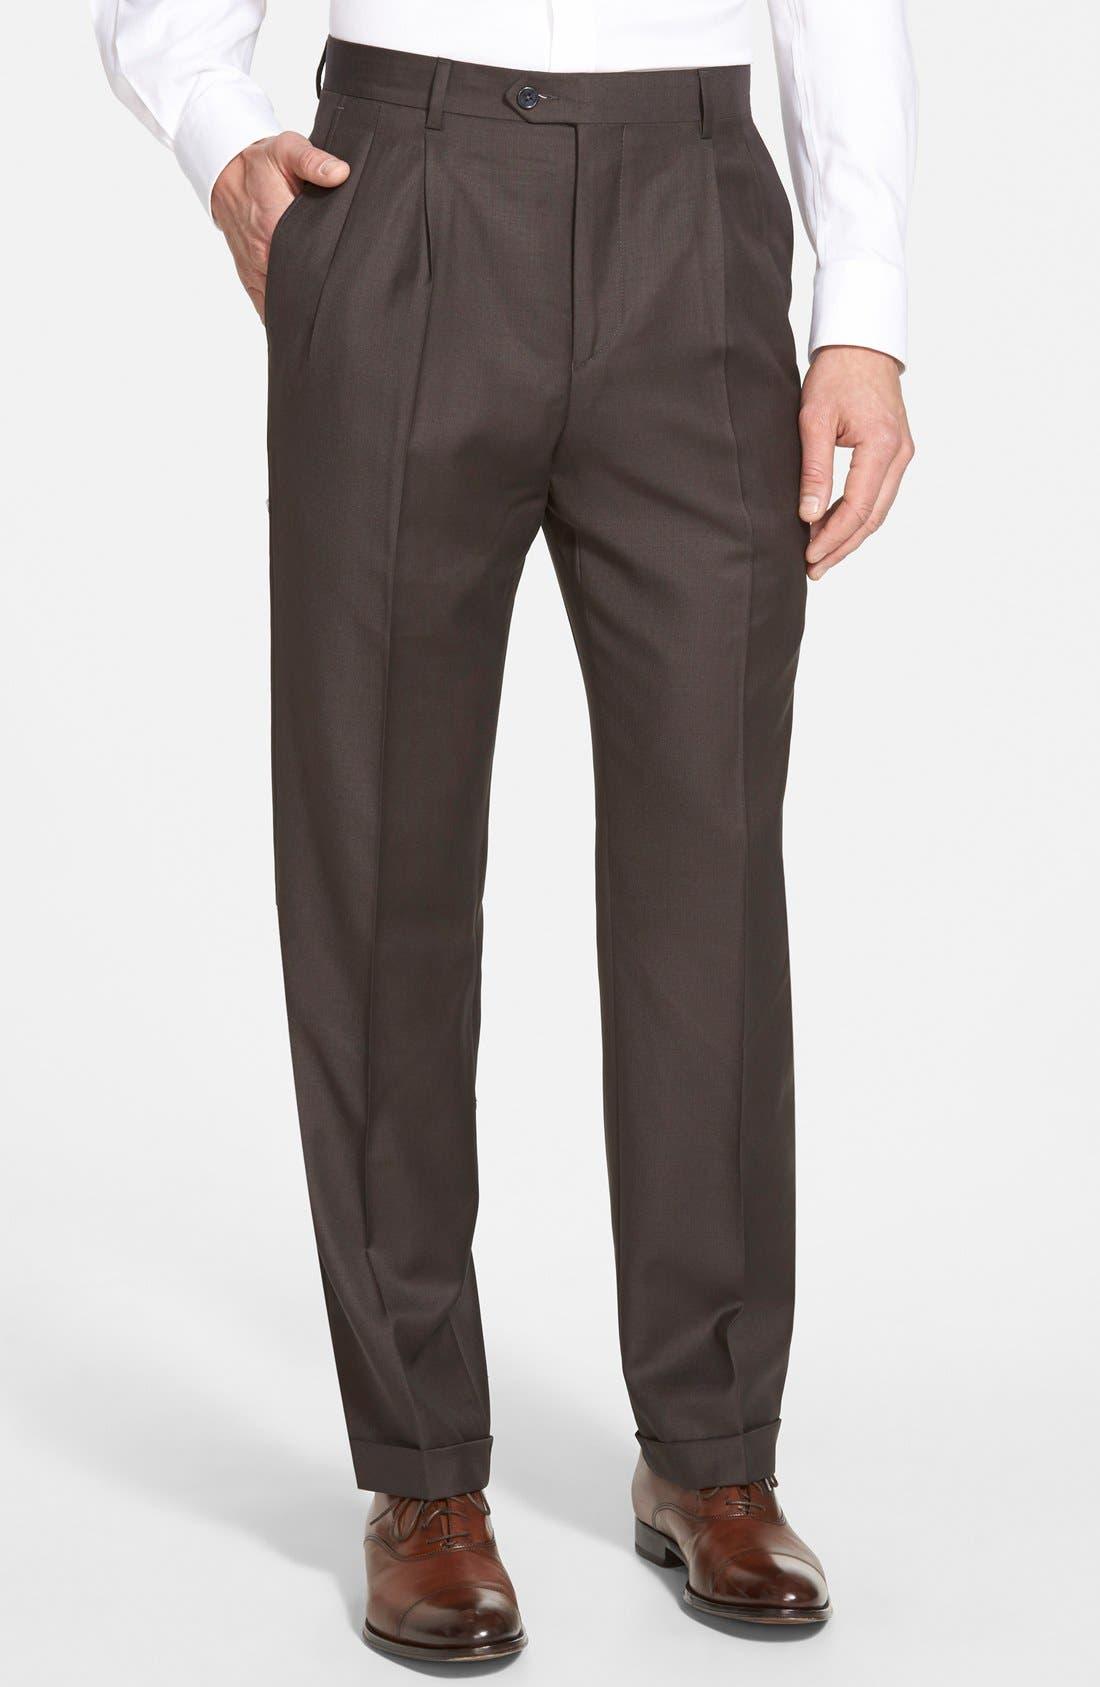 Men's Pleated Pants: Cargo Pants, Dress Pants, Chinos & More ...